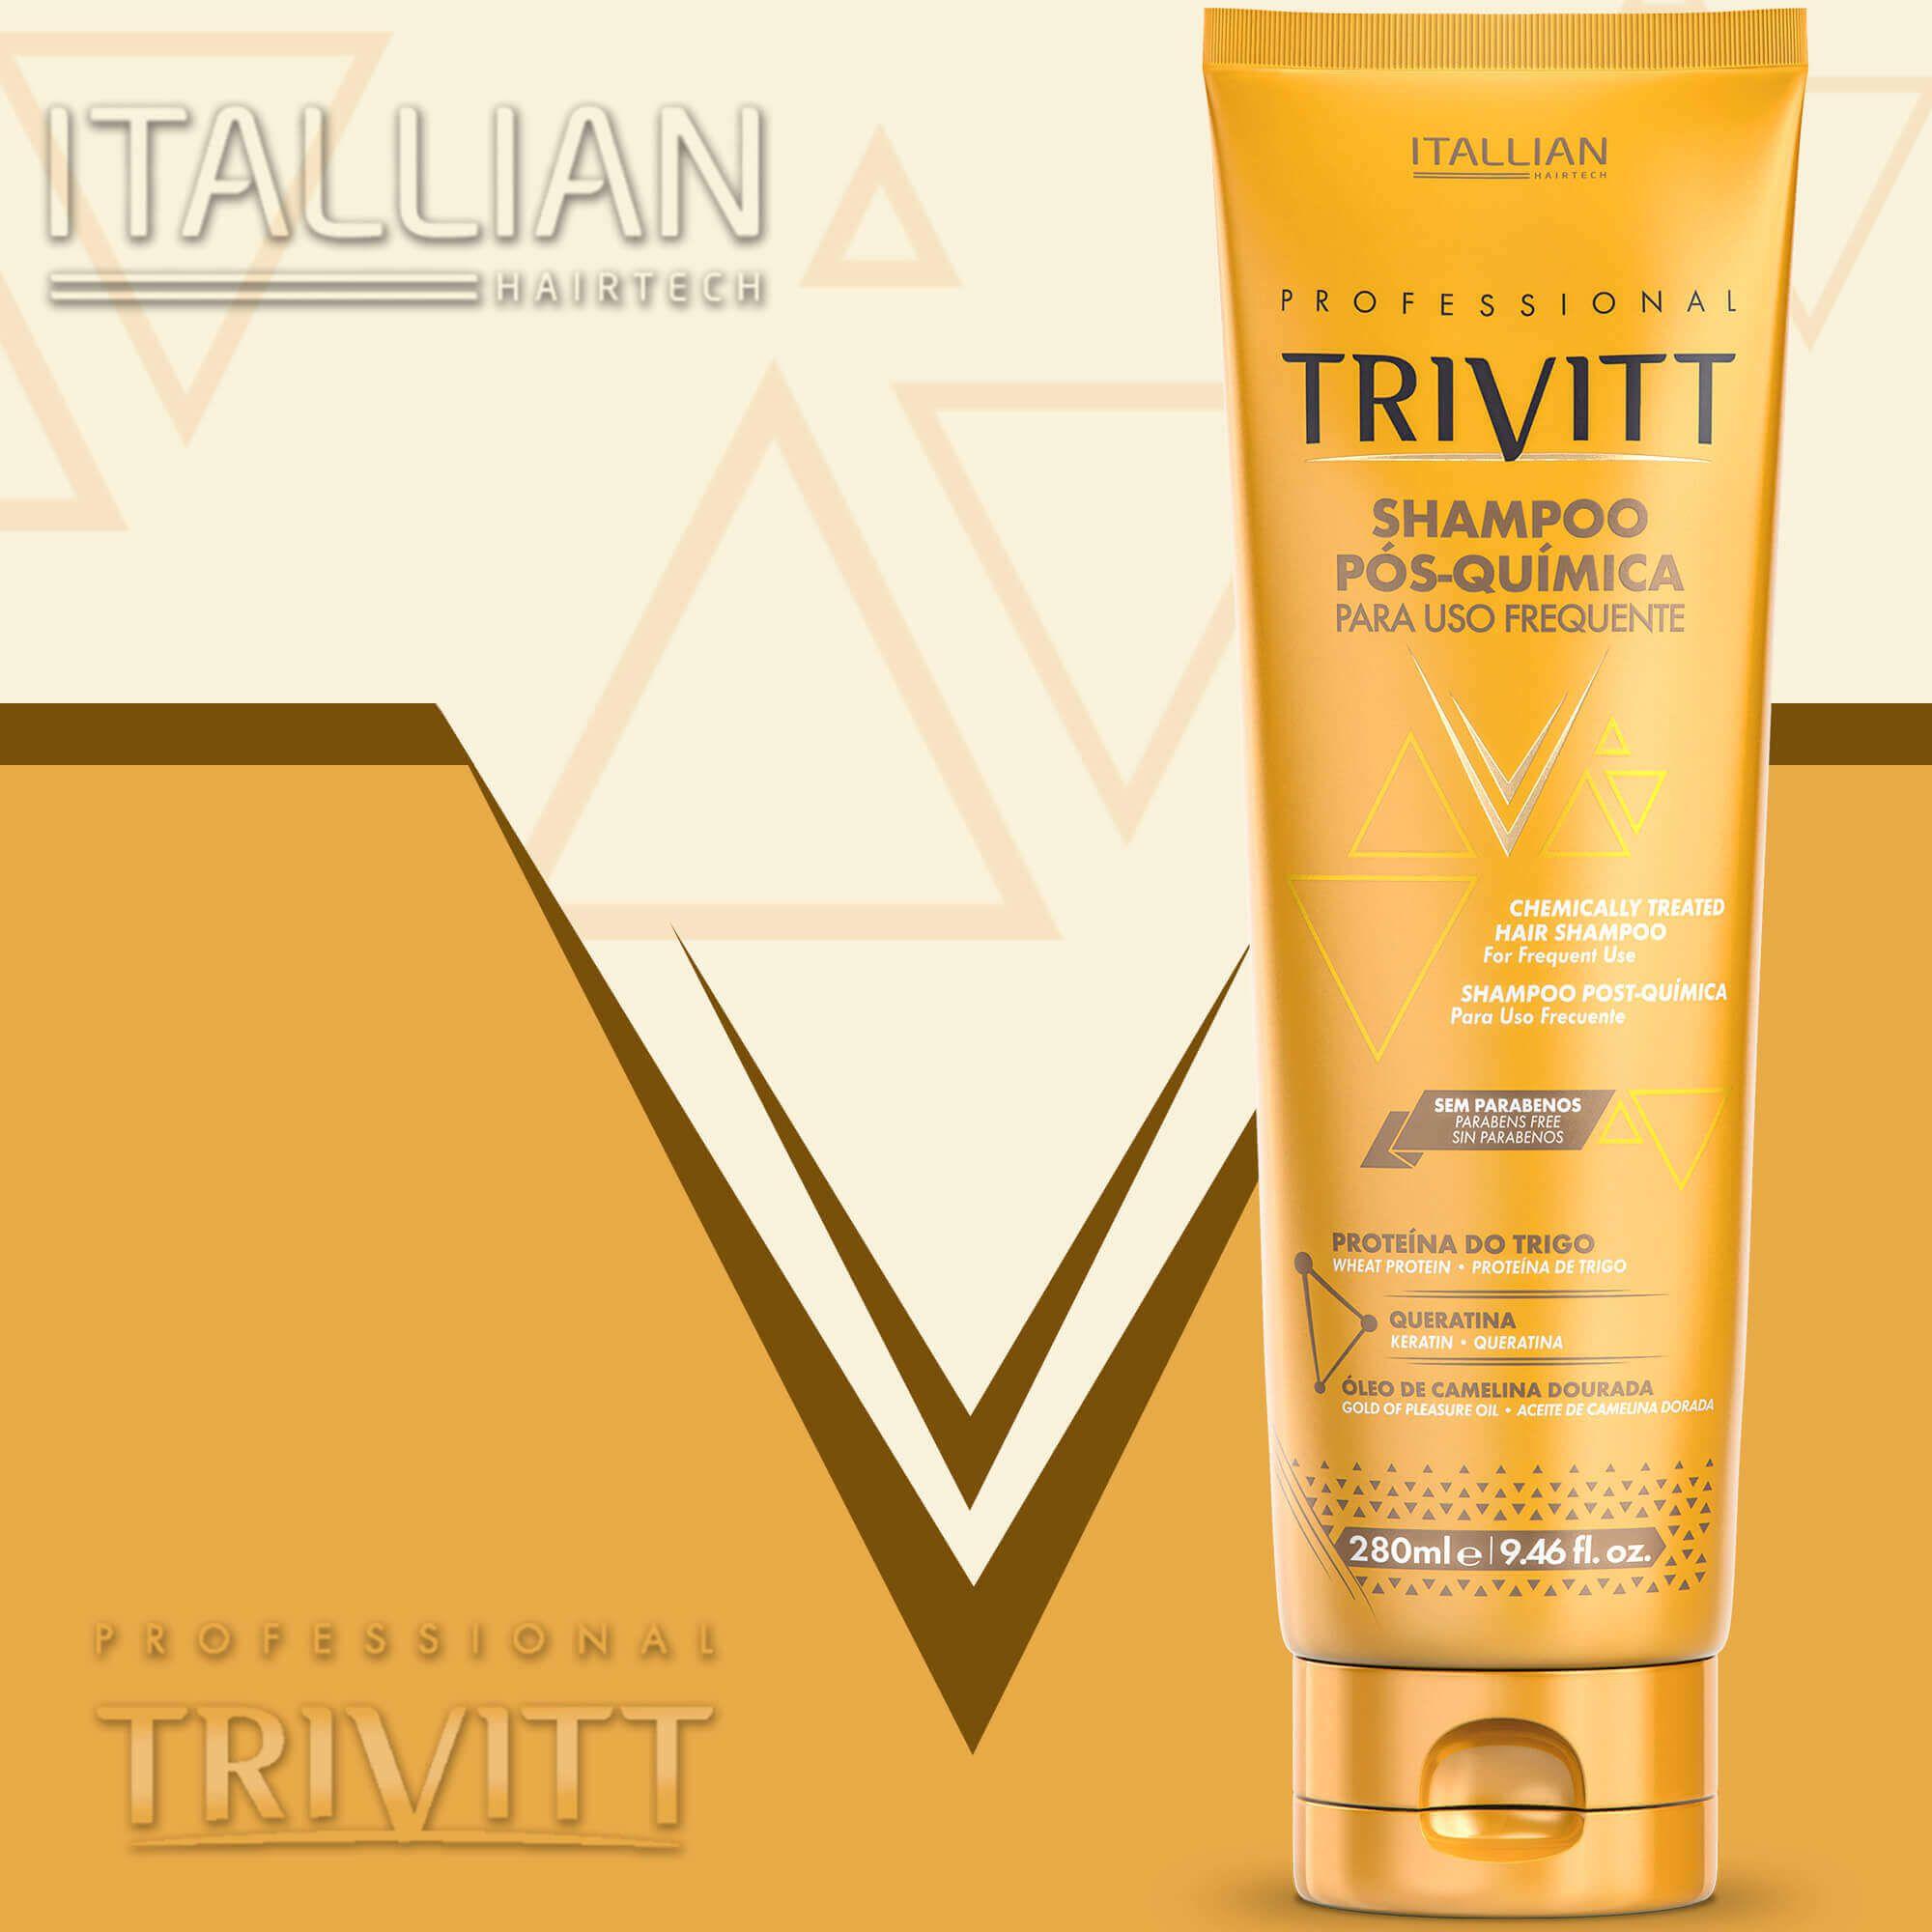 Shampoo Pós-química Itallian Para Uso Frequente 280ml